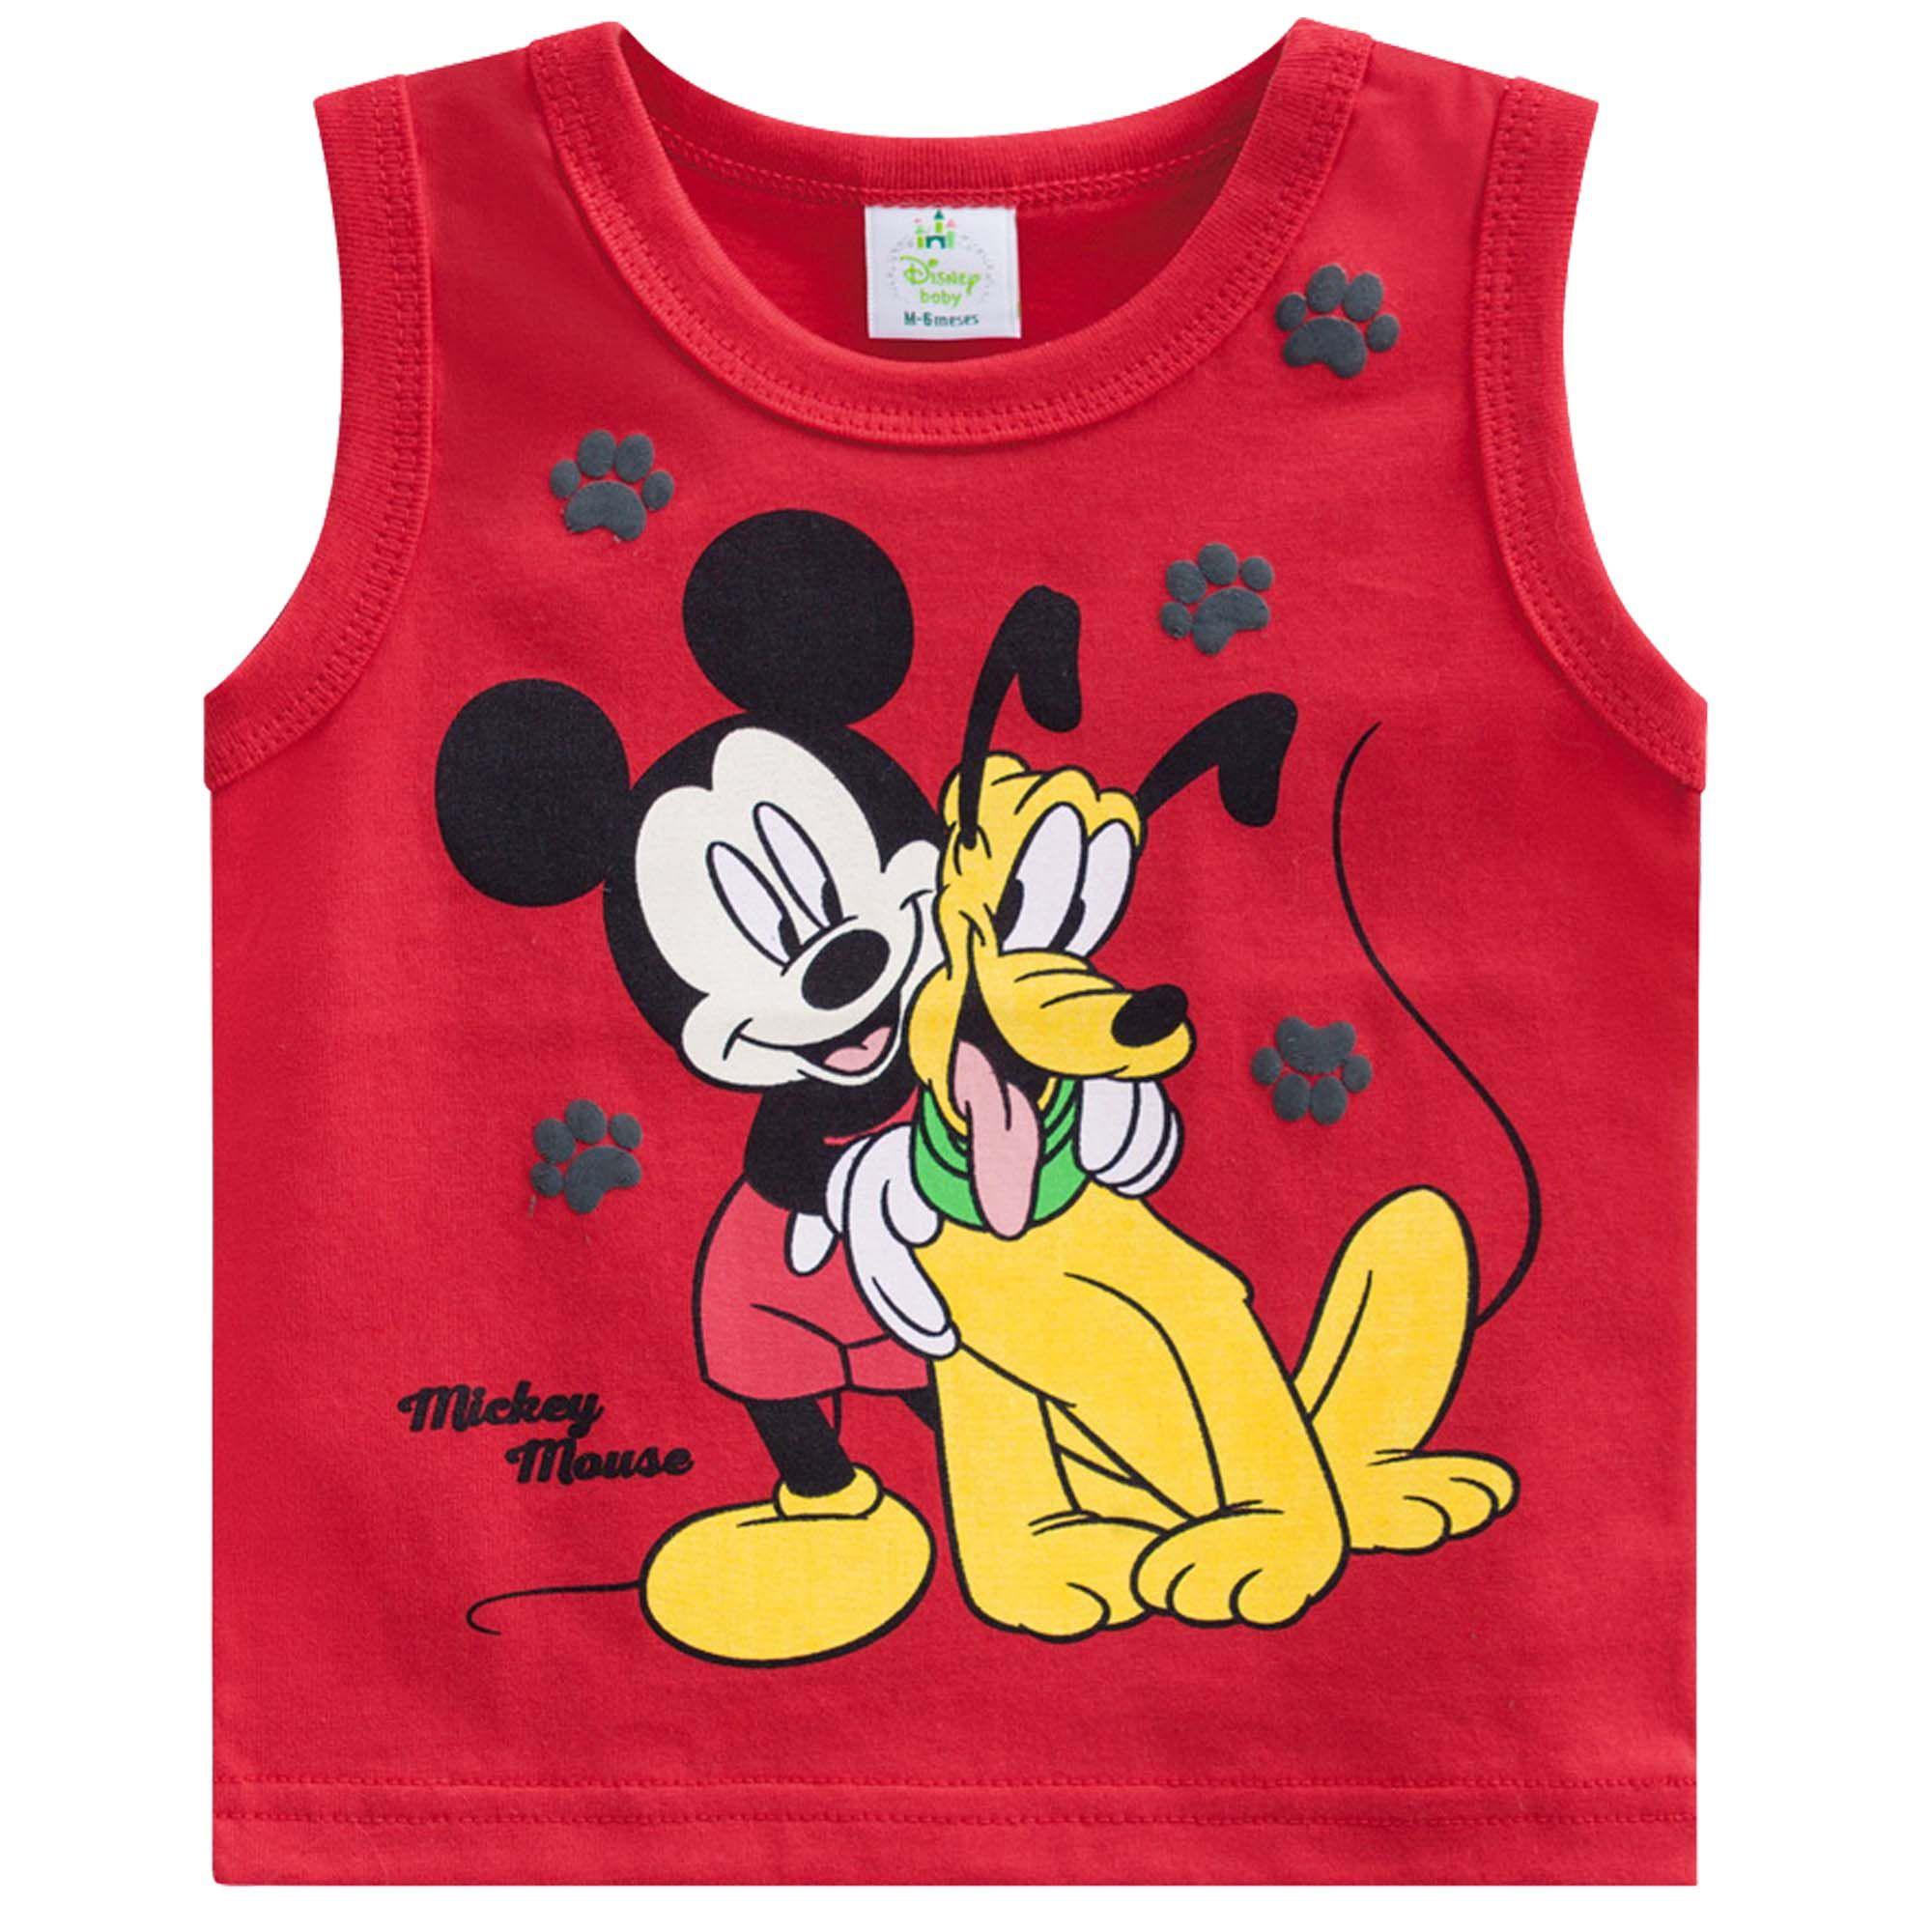 Regata Brandili Disney Mickey Mouse e Pluto - P ao G